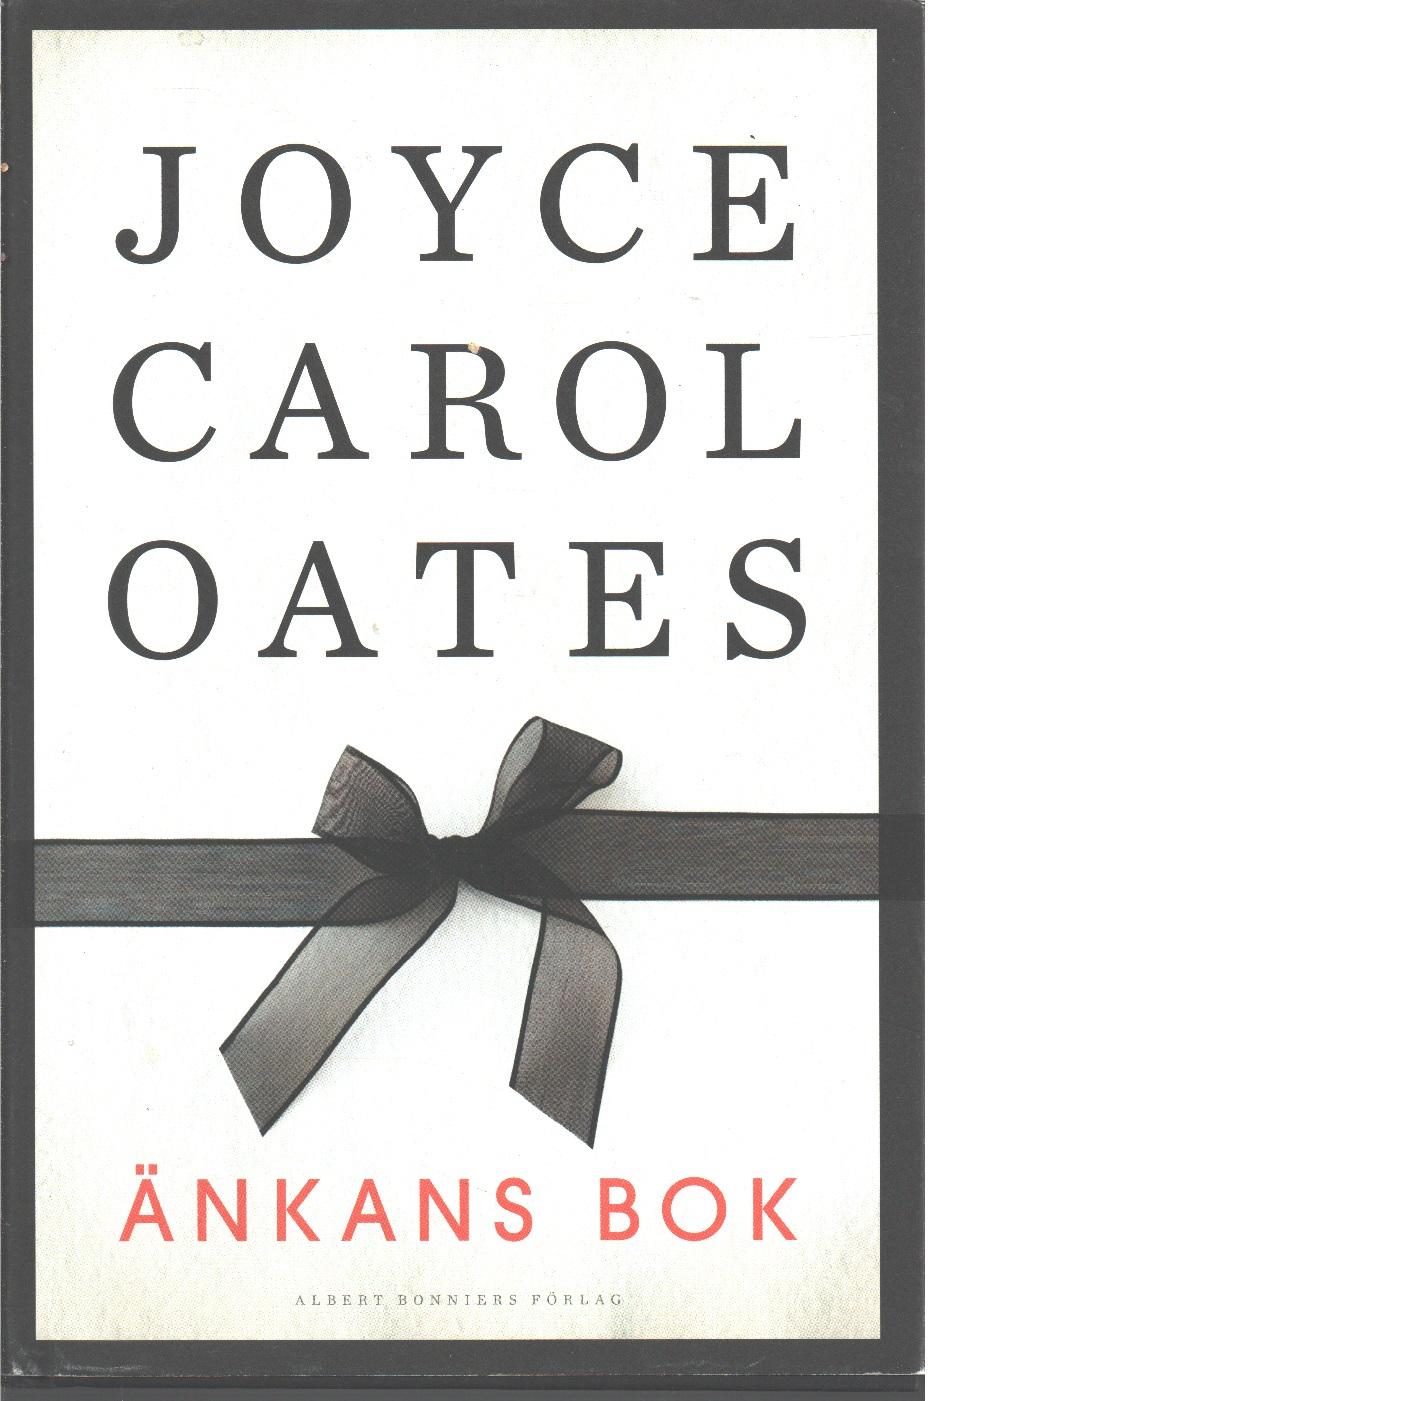 Änkans bok - Oates, Joyce Carol